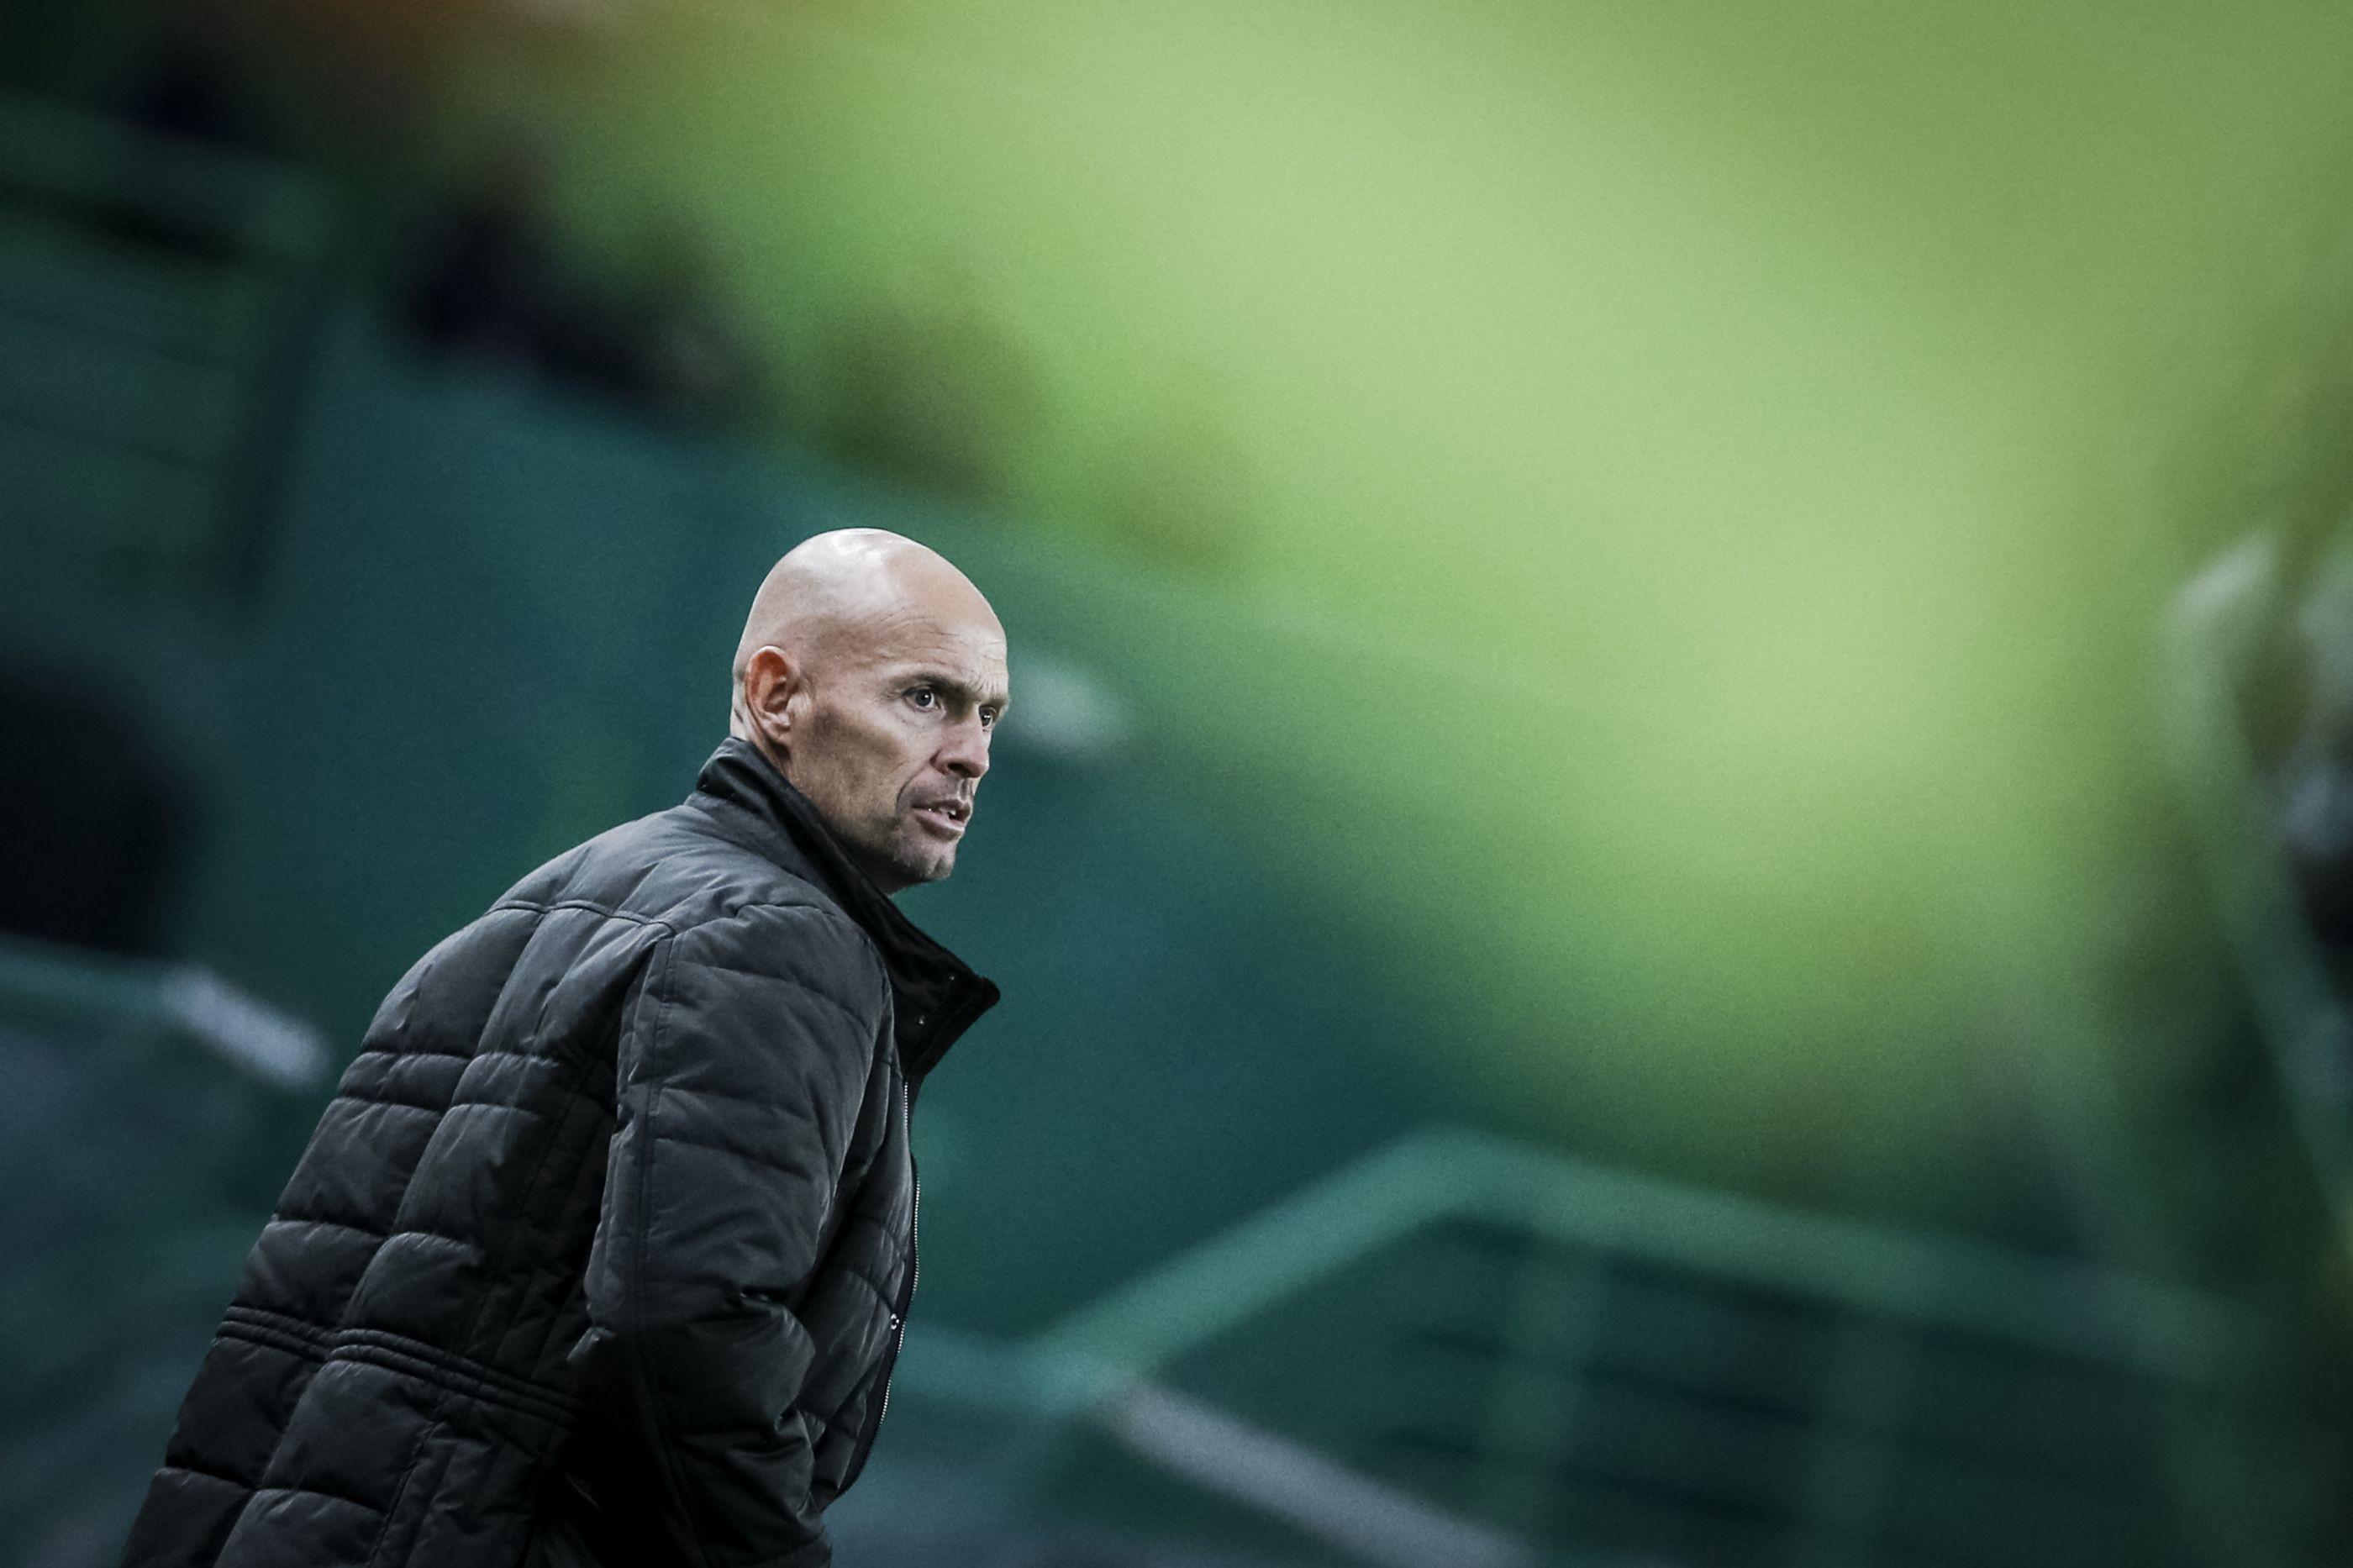 Luiz Phellype 'estreia-se' nos convocados de Keizer. Bas Dost regressa